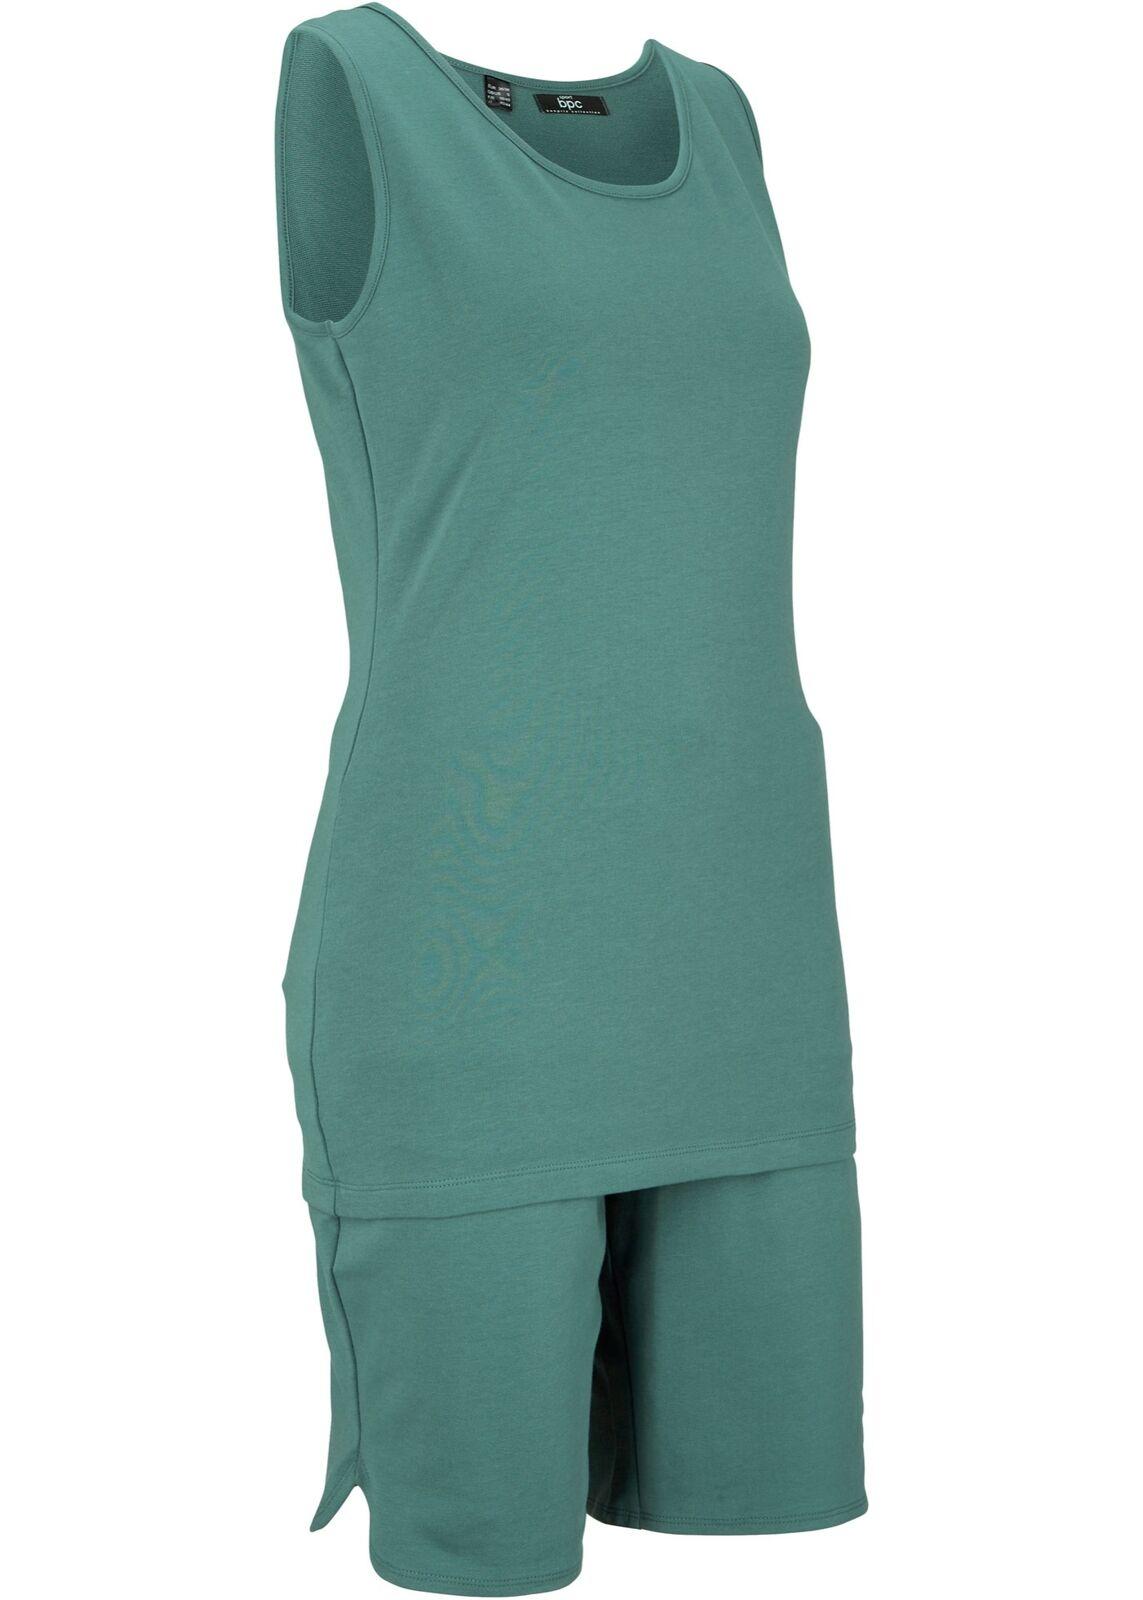 2-tlg. Bequeme Top und Shorts Gr. 36/38 Graugrün Damentop Bermuda Sport-Set Neu